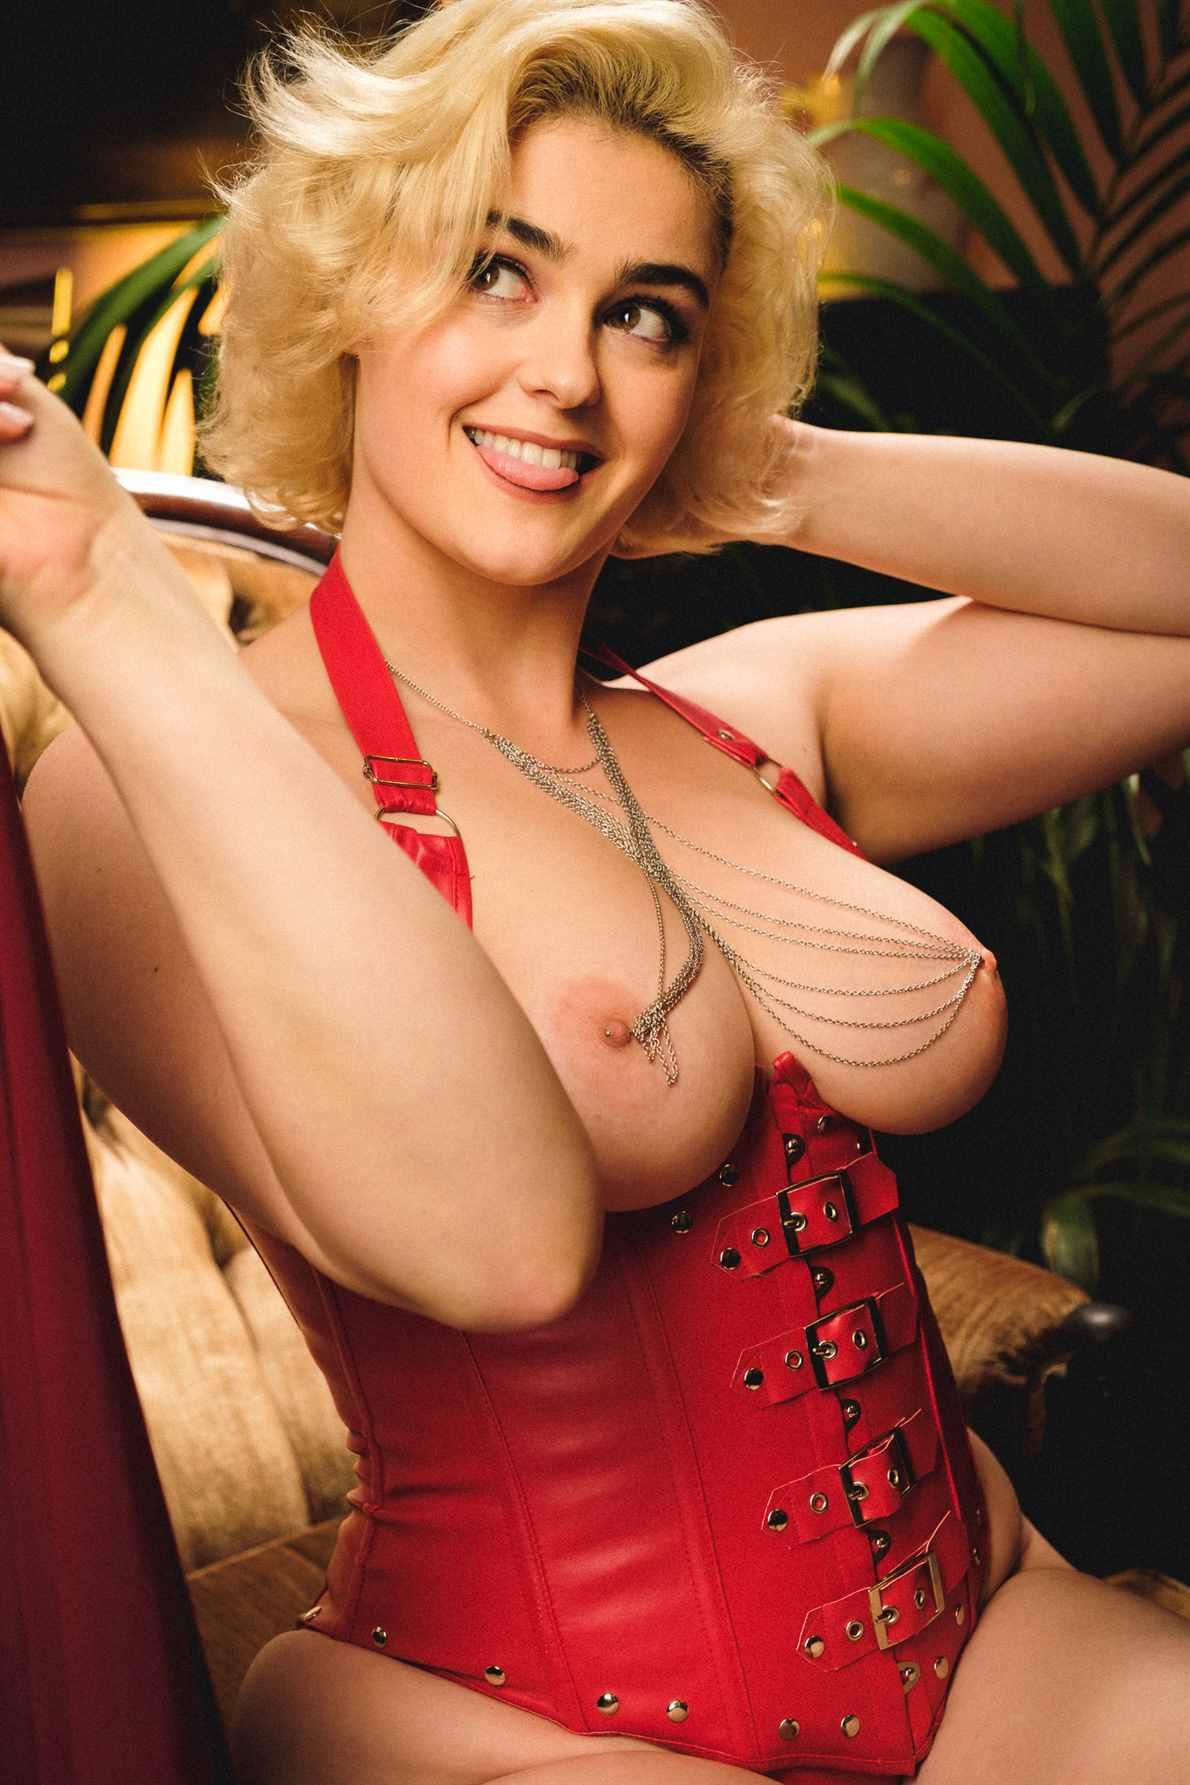 Stefania Ferrario Leaked Nude Photos 0002